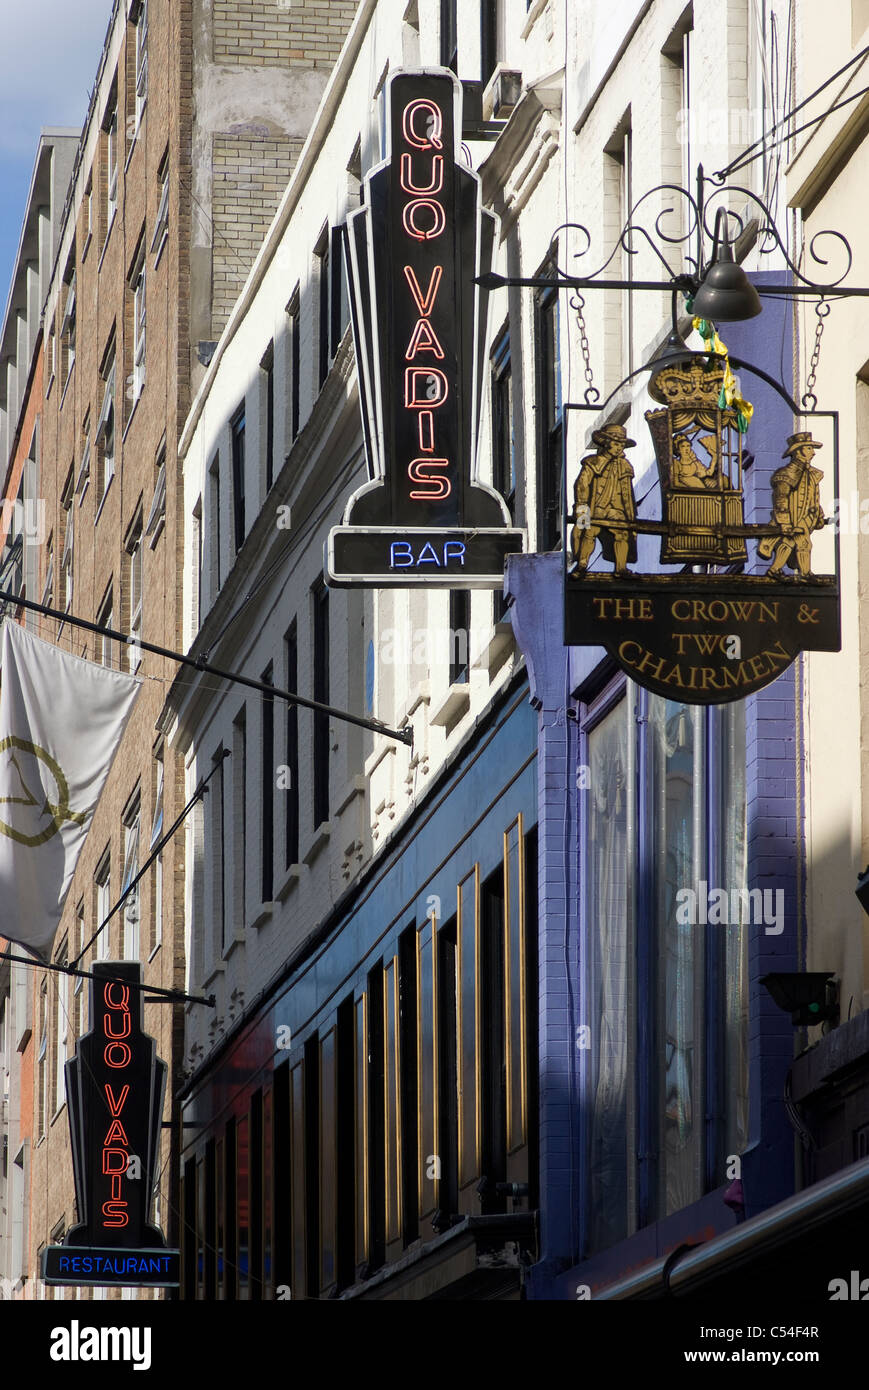 Pub and restaurant, Dean Street., Soho, London, W1, England - Stock Image